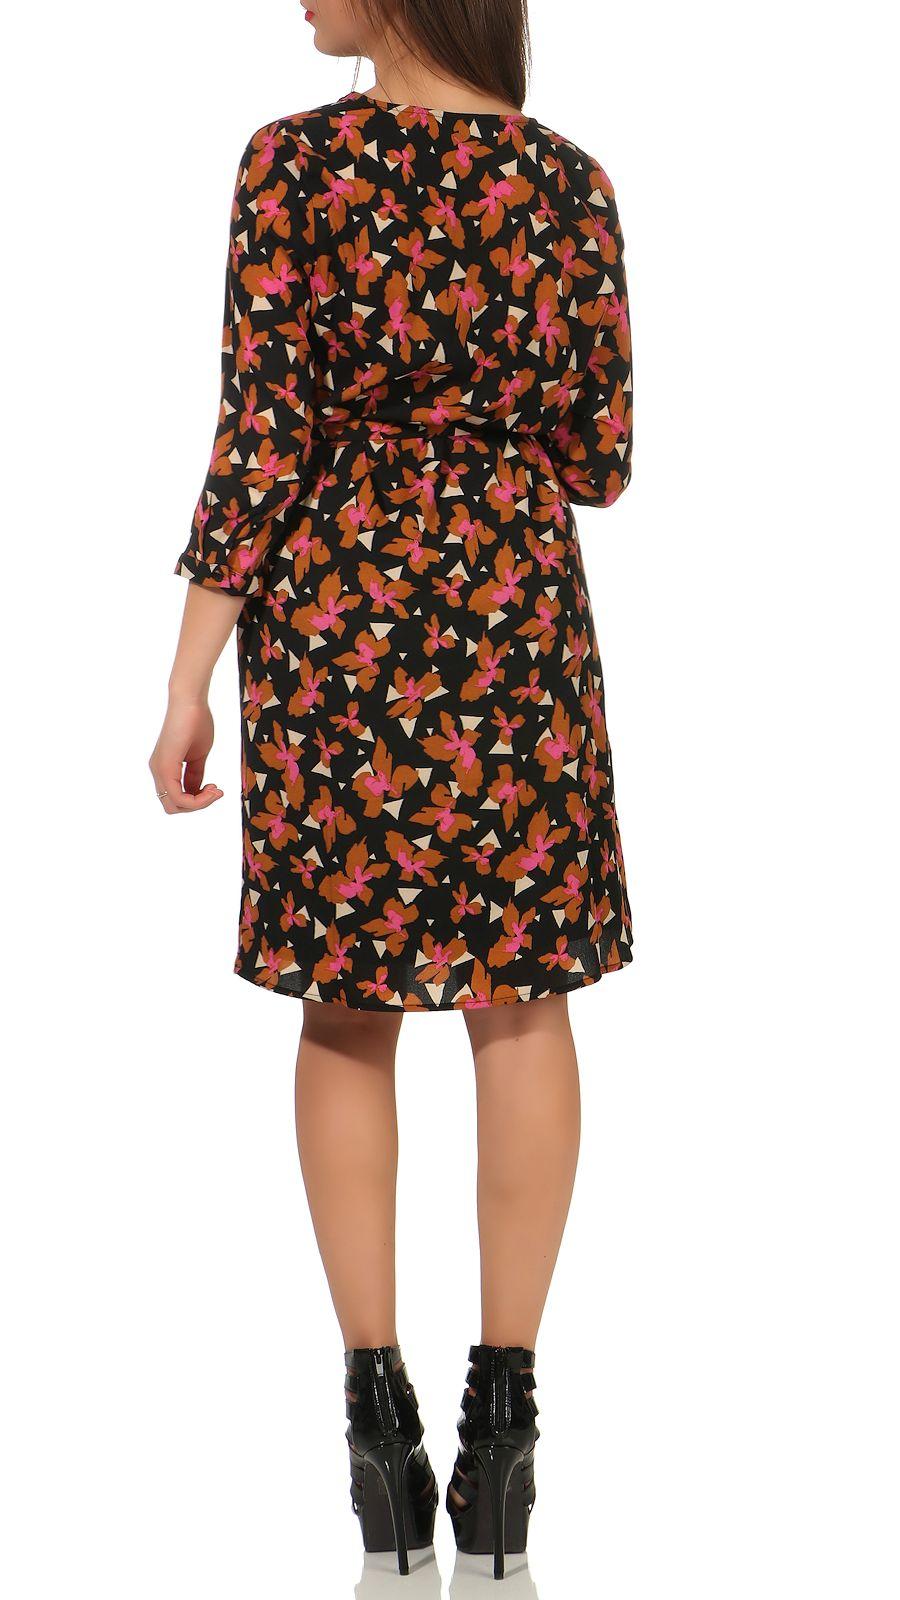 Vero Moda Damen Kleid Grace | Röcke/ Kleider | Damen | L.E ...